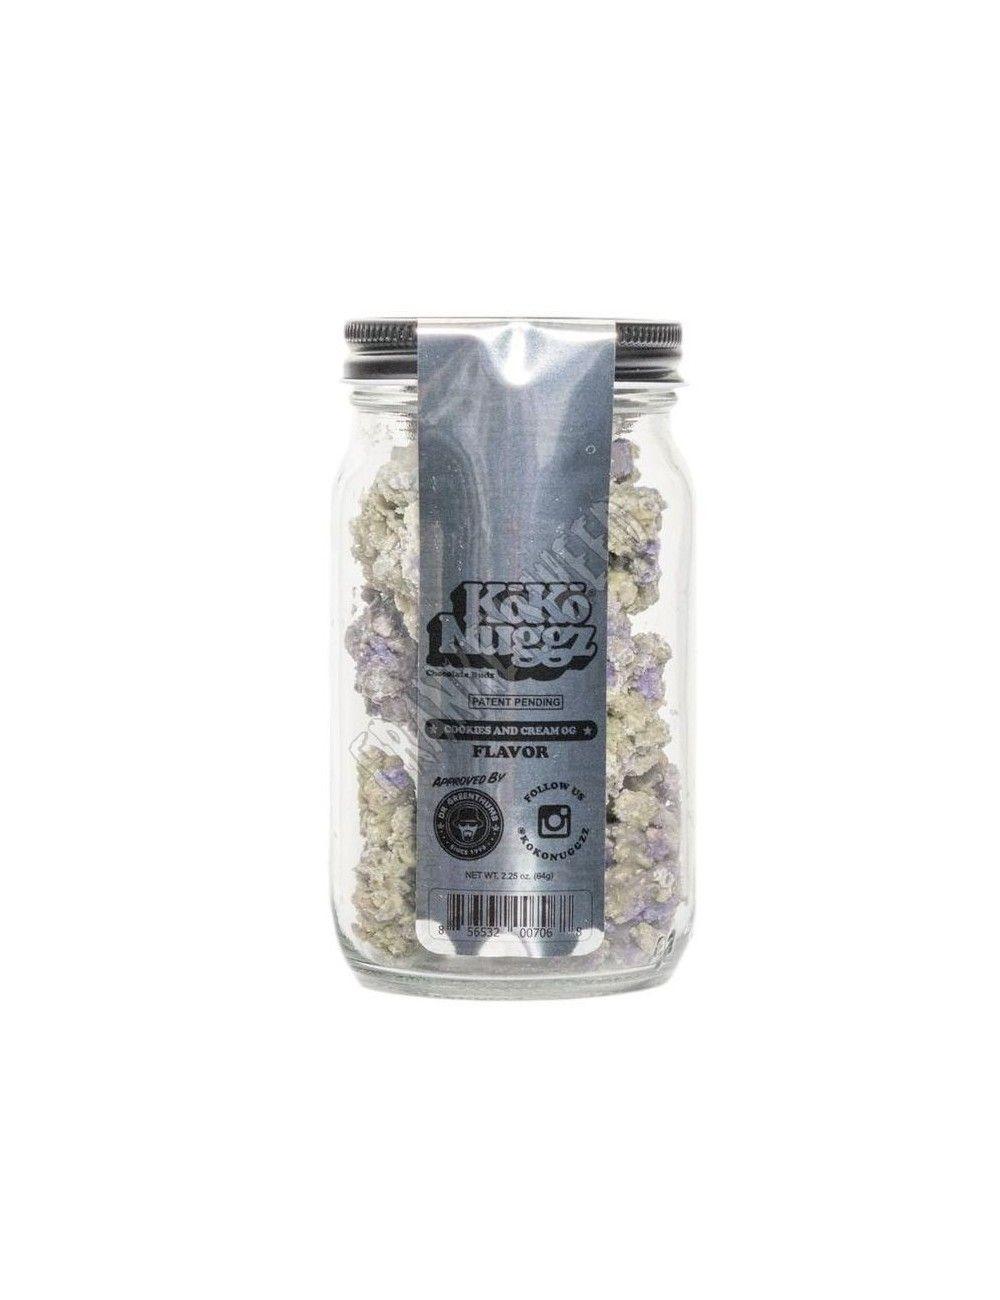 Koko Nuggz - Chocolate Bud - 2.25oz (Glass Jar)